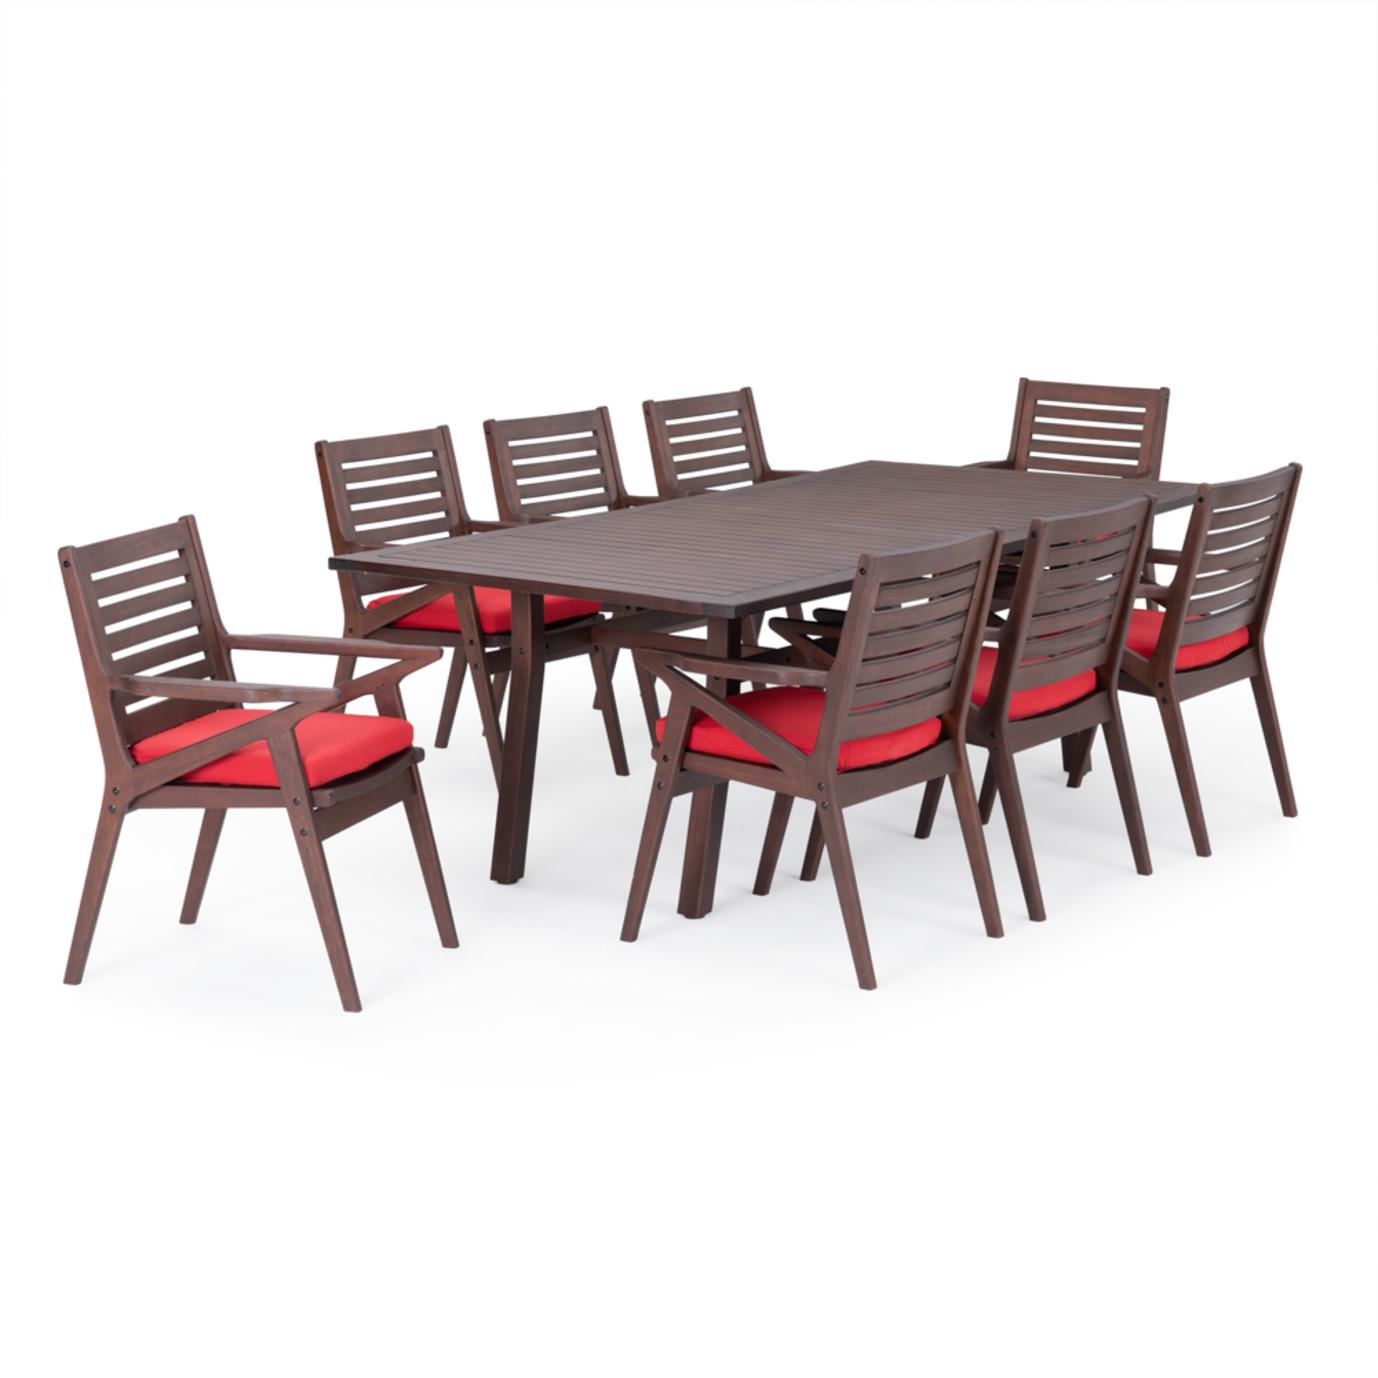 Vaughn 9 Piece Dining Set - Sunset Red